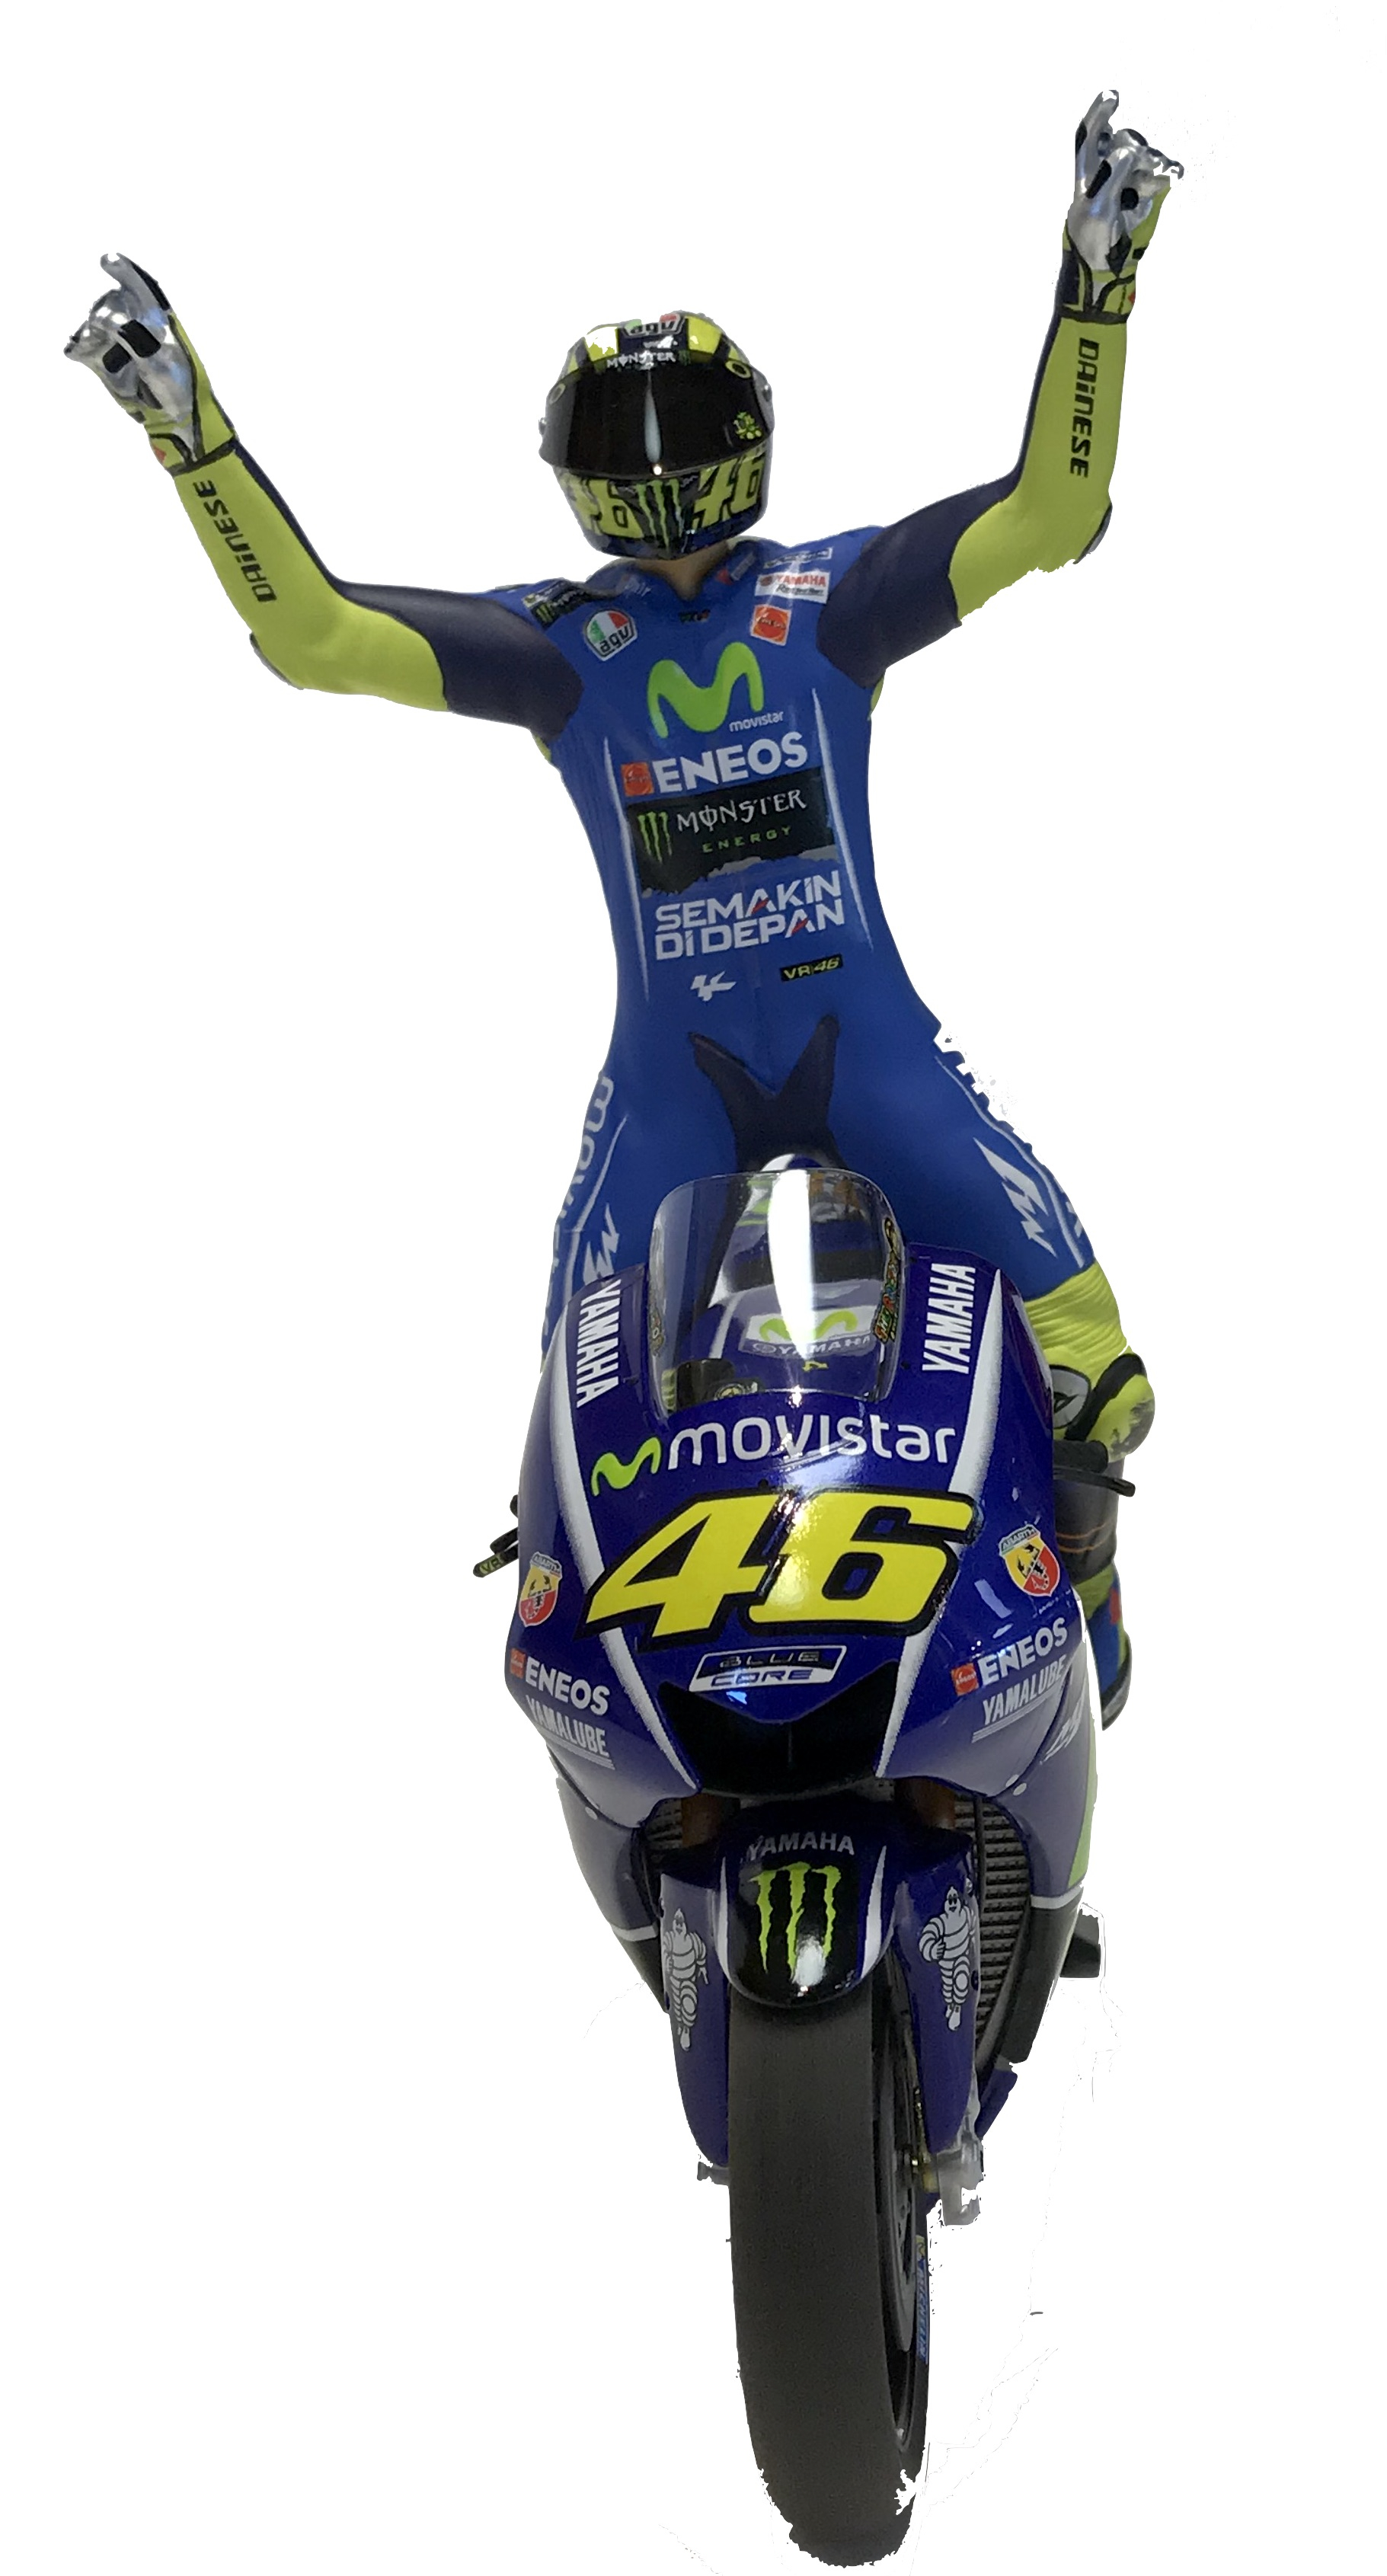 Valentino Rossi Movistar Yamaha Winner Moto GP Assen 2017 Limited Edition 1500 Pcs Scala 1/12